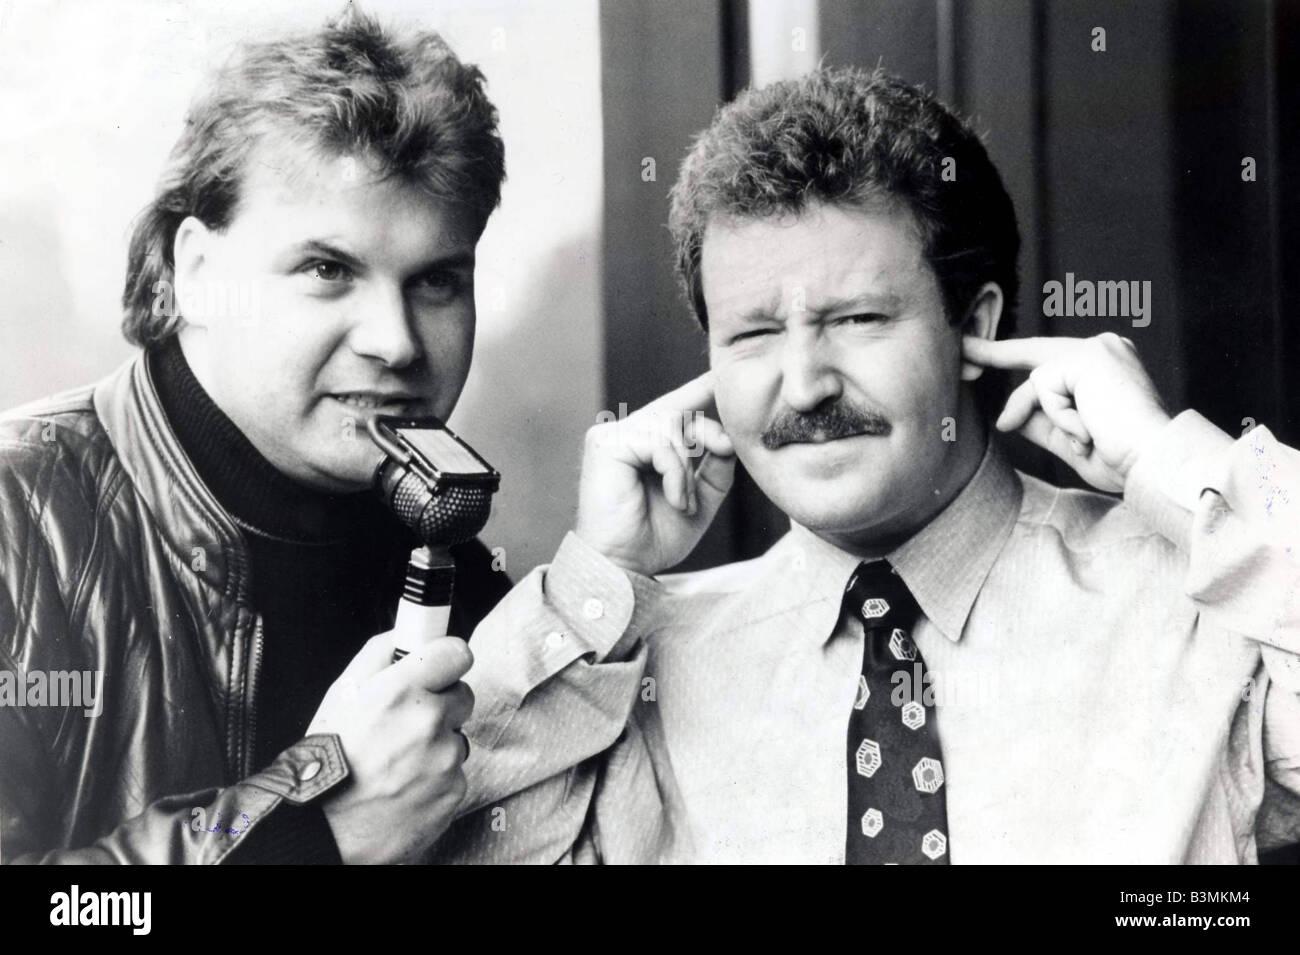 Derek Johnstone 1990 With Jonathan Watson comedian mirrorpix - Stock Image